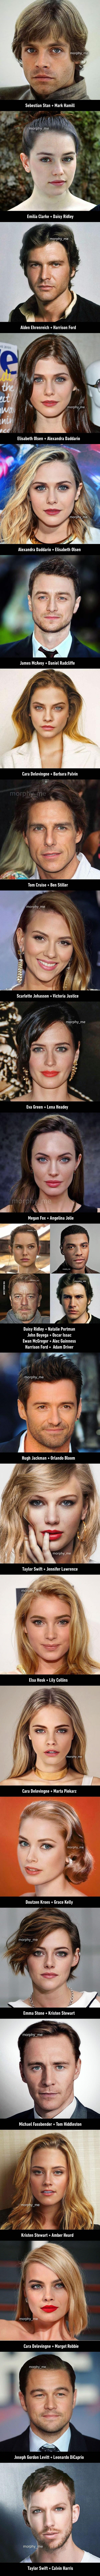 Photoshop master artist combines celeb faces